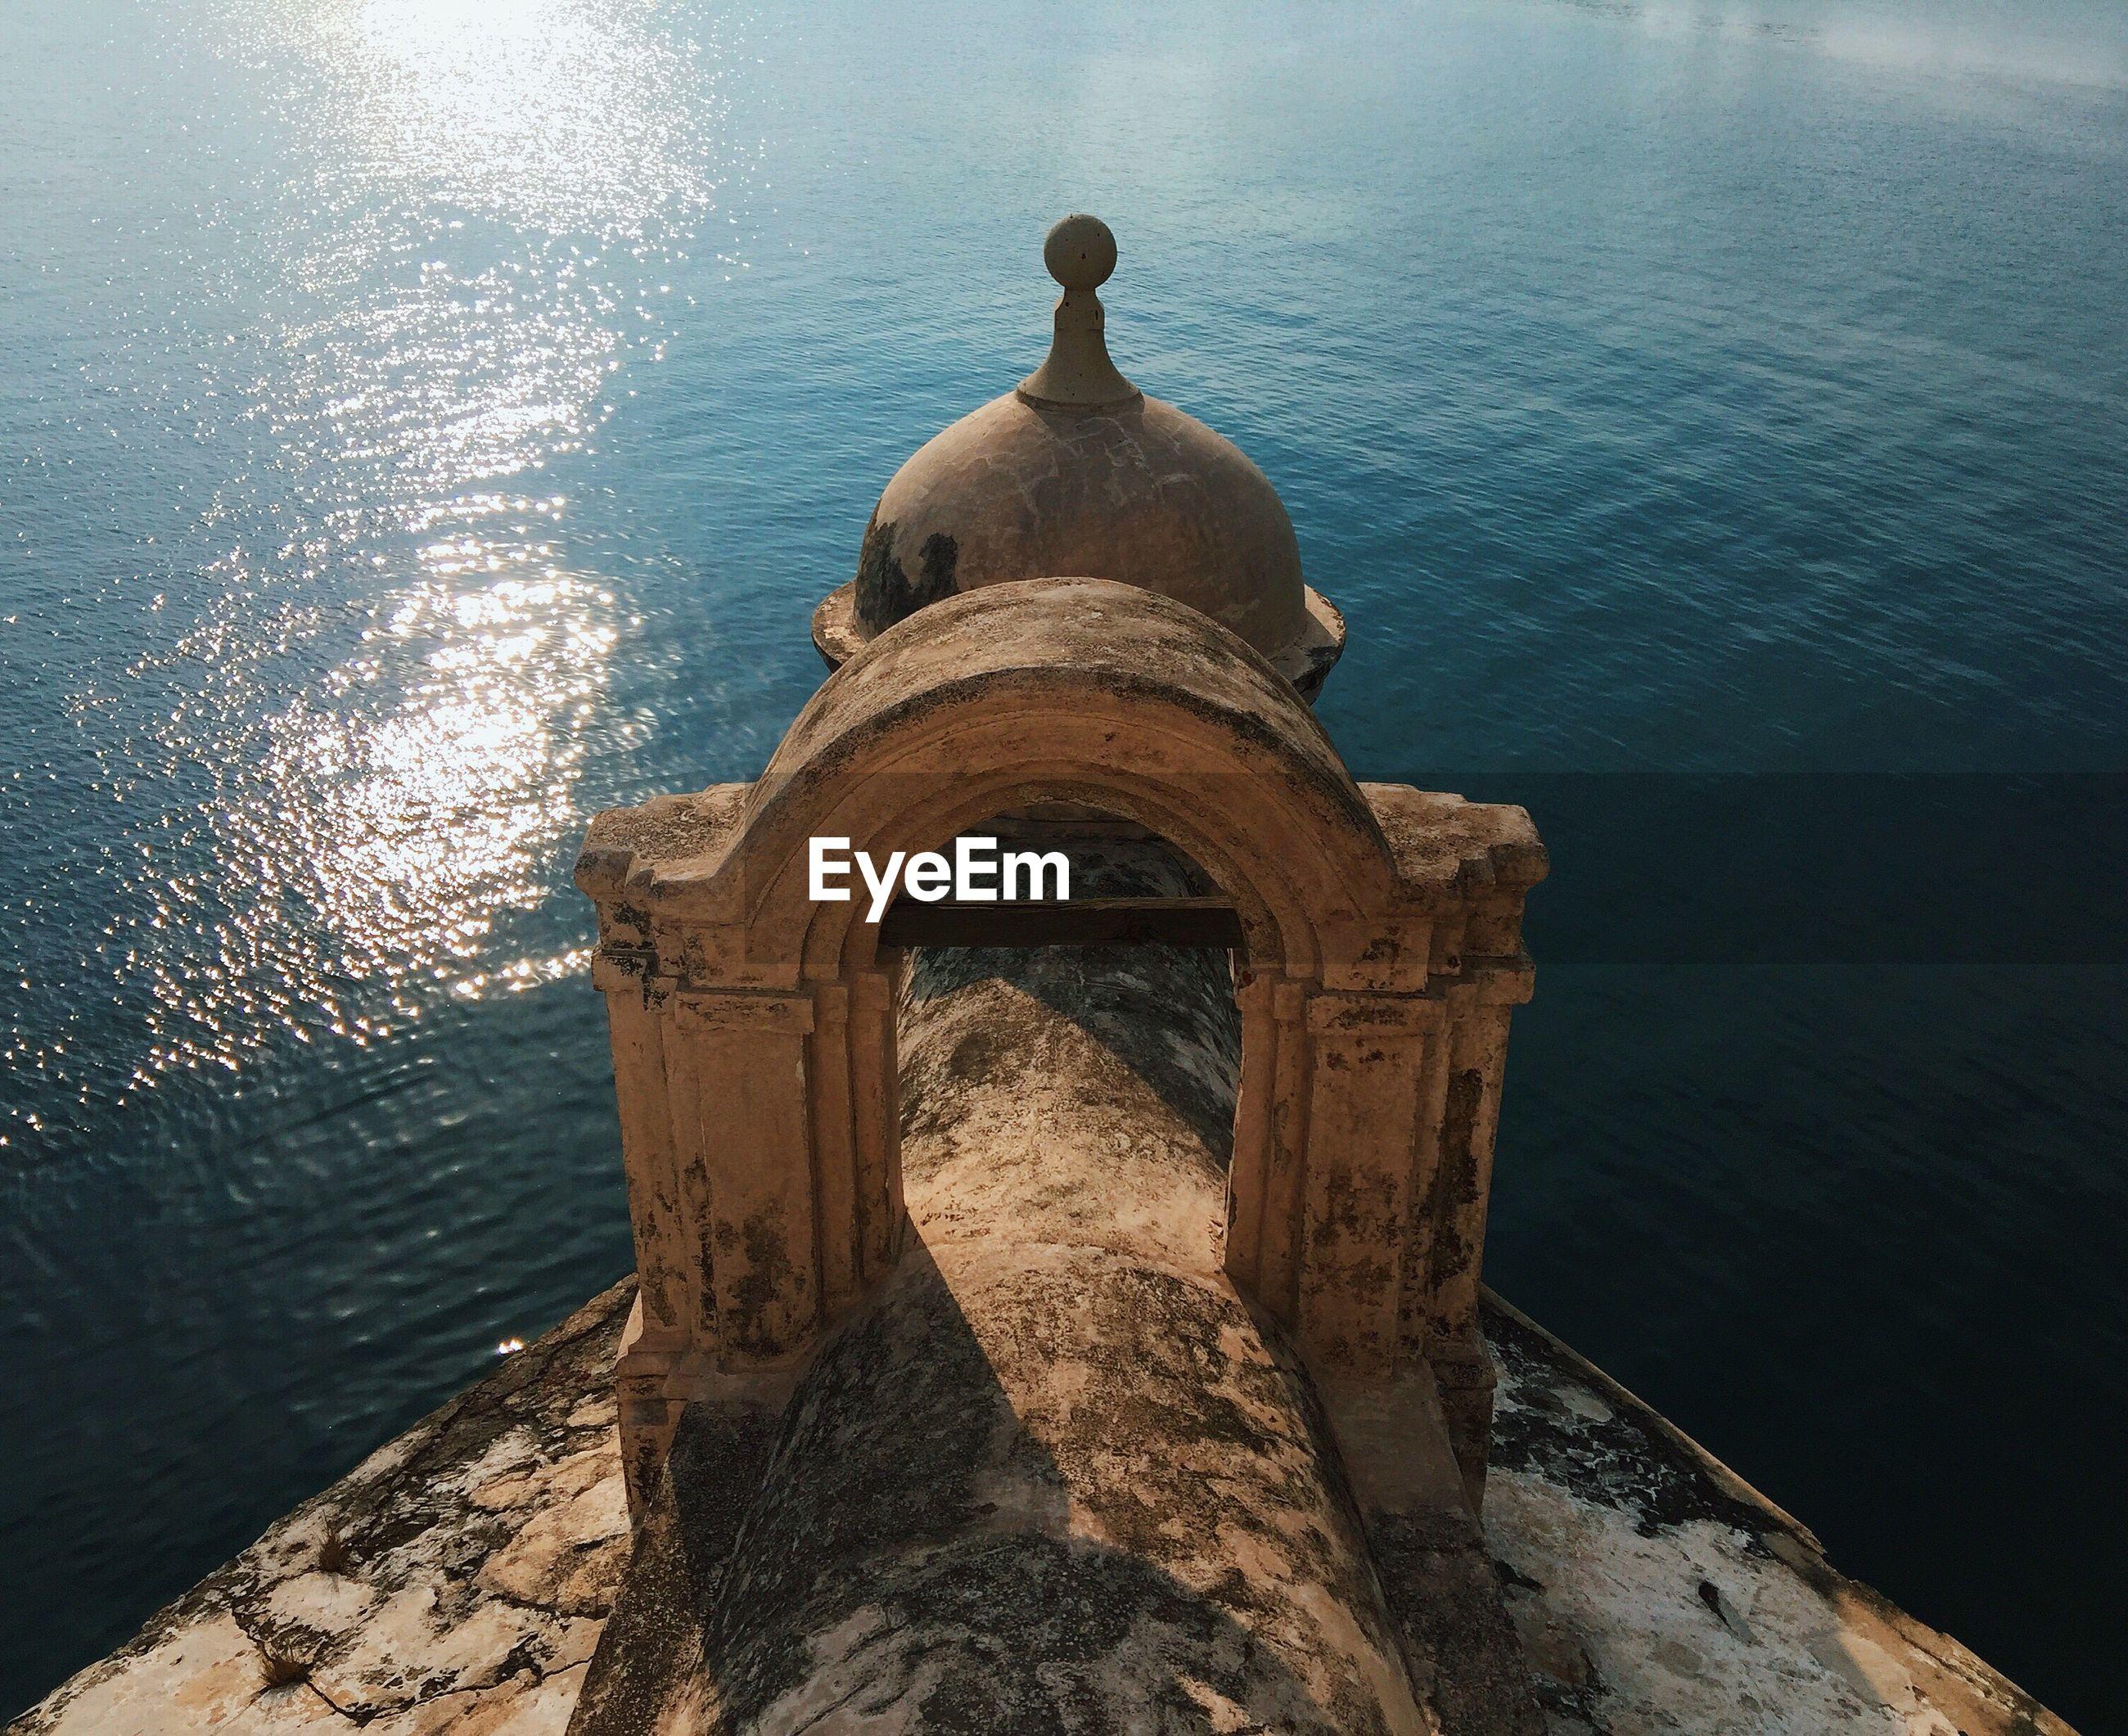 Cropped image of san juan de ulua overlooking sea